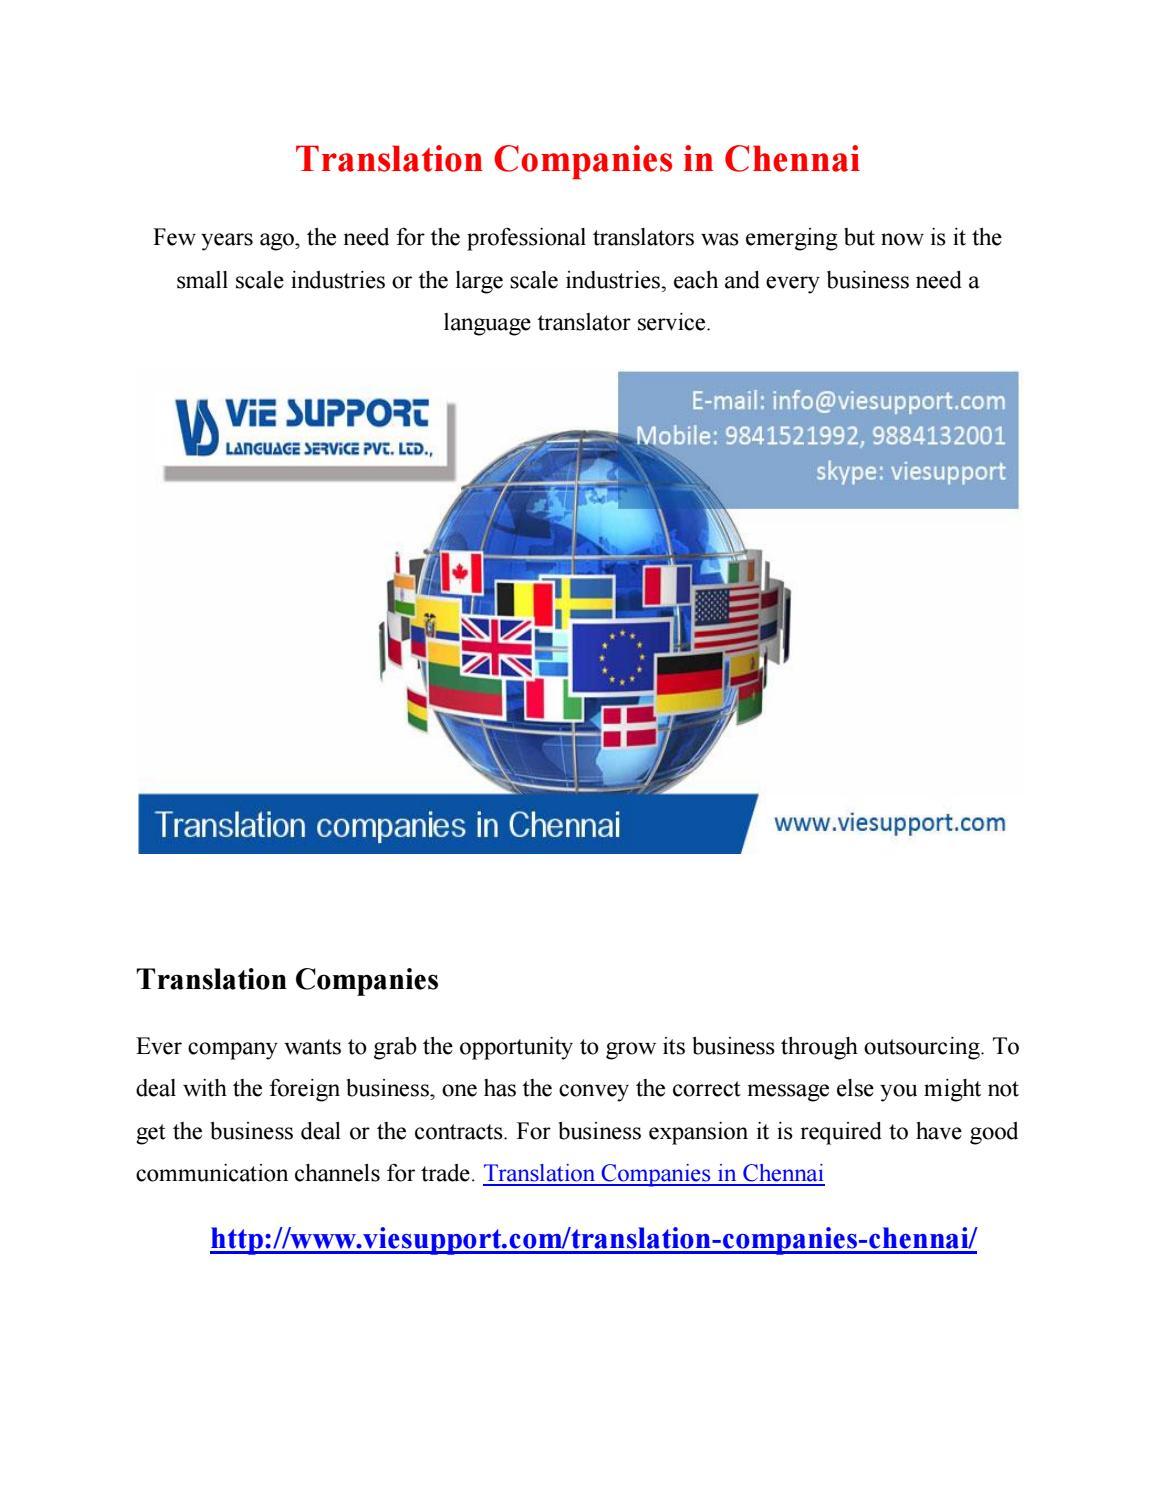 Translation Companies In Chennai By Ravikumar9413 Issuu